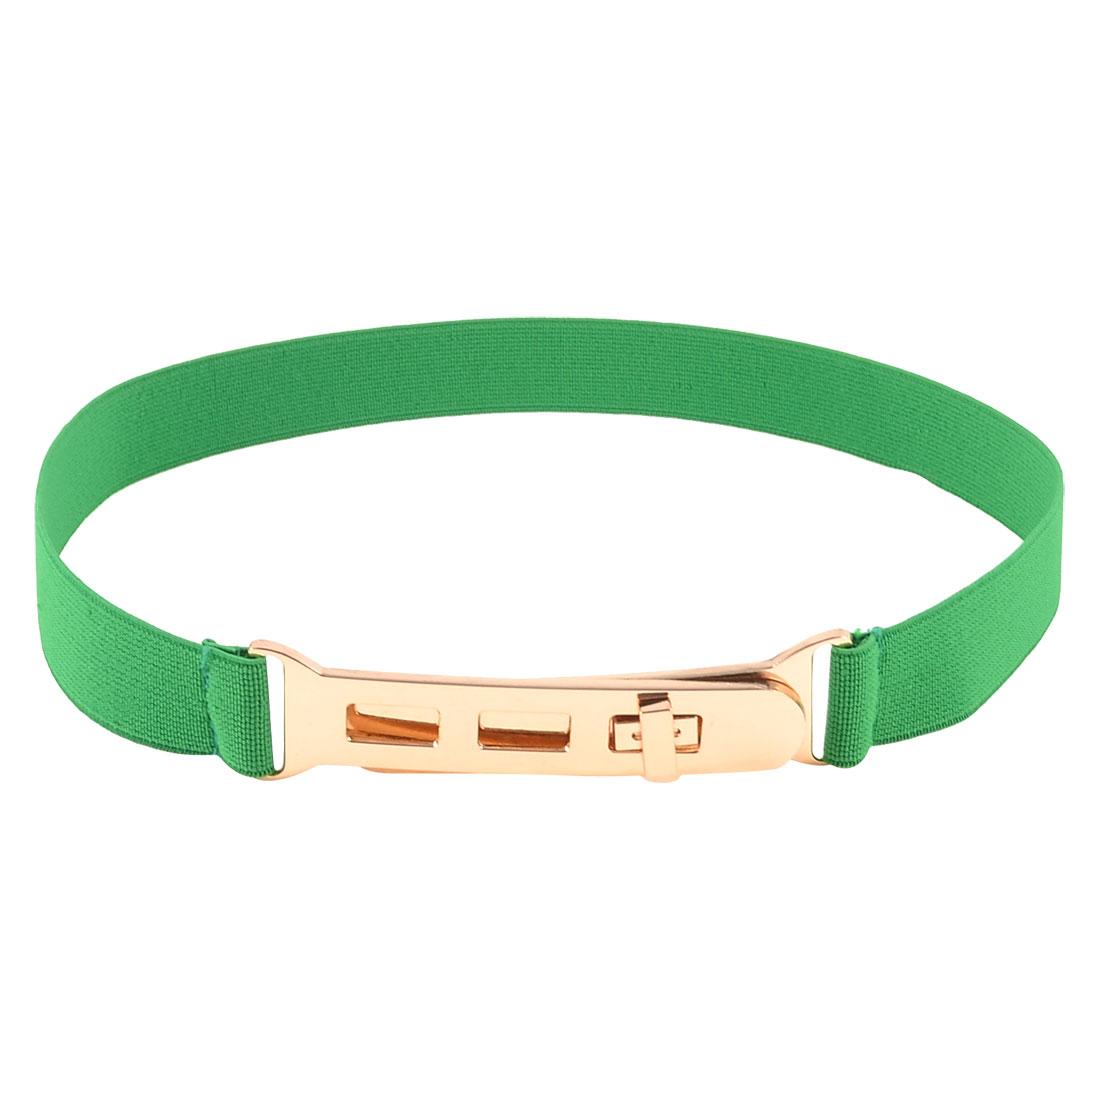 Green Stretch Cinch Waist Belt for Girls Ladies Women